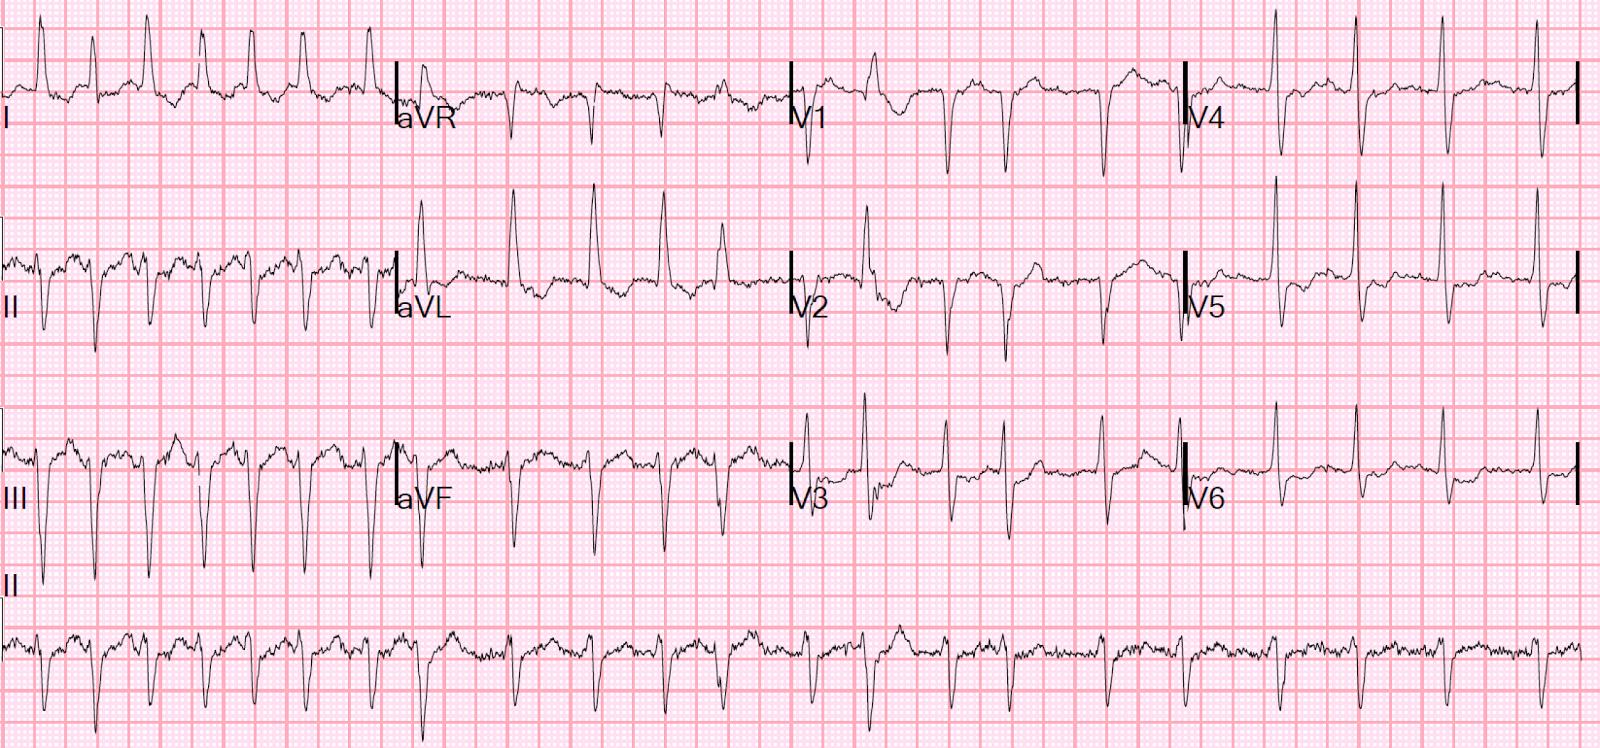 Atrial fibrillation ecg strip images 895